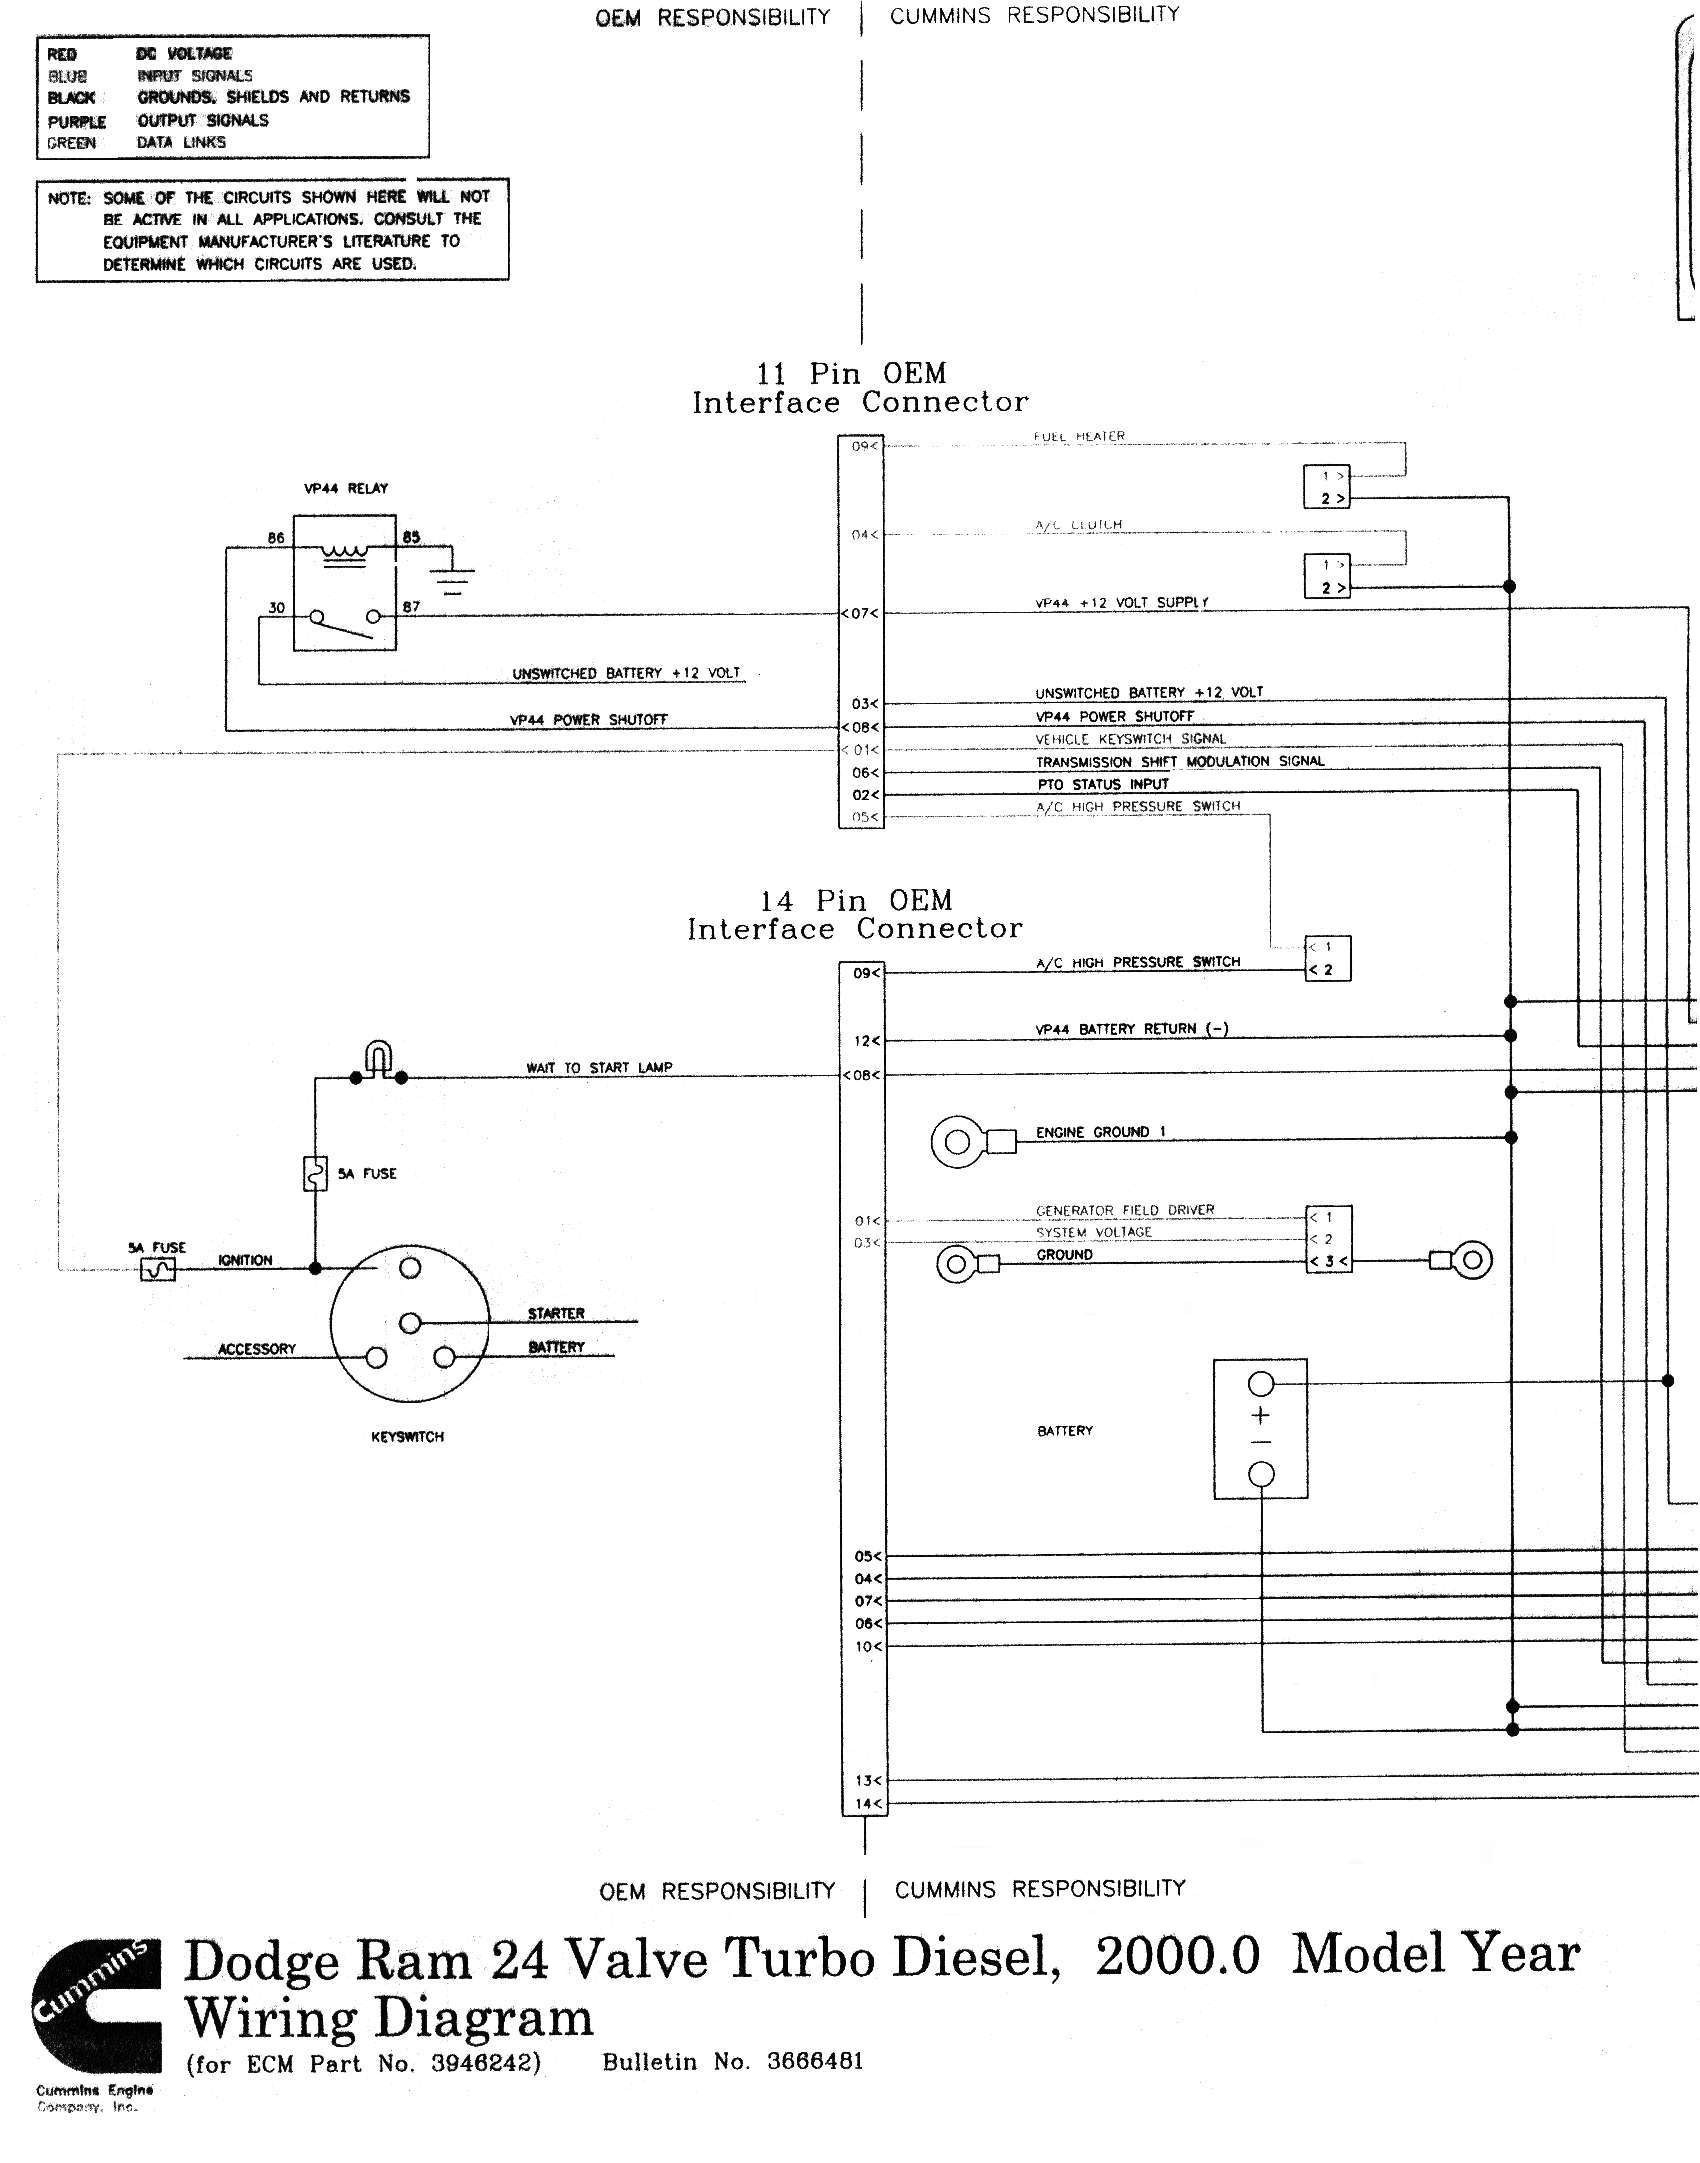 2002 dodge ram 1500 wiring diagram of baby being born 02 alternator library